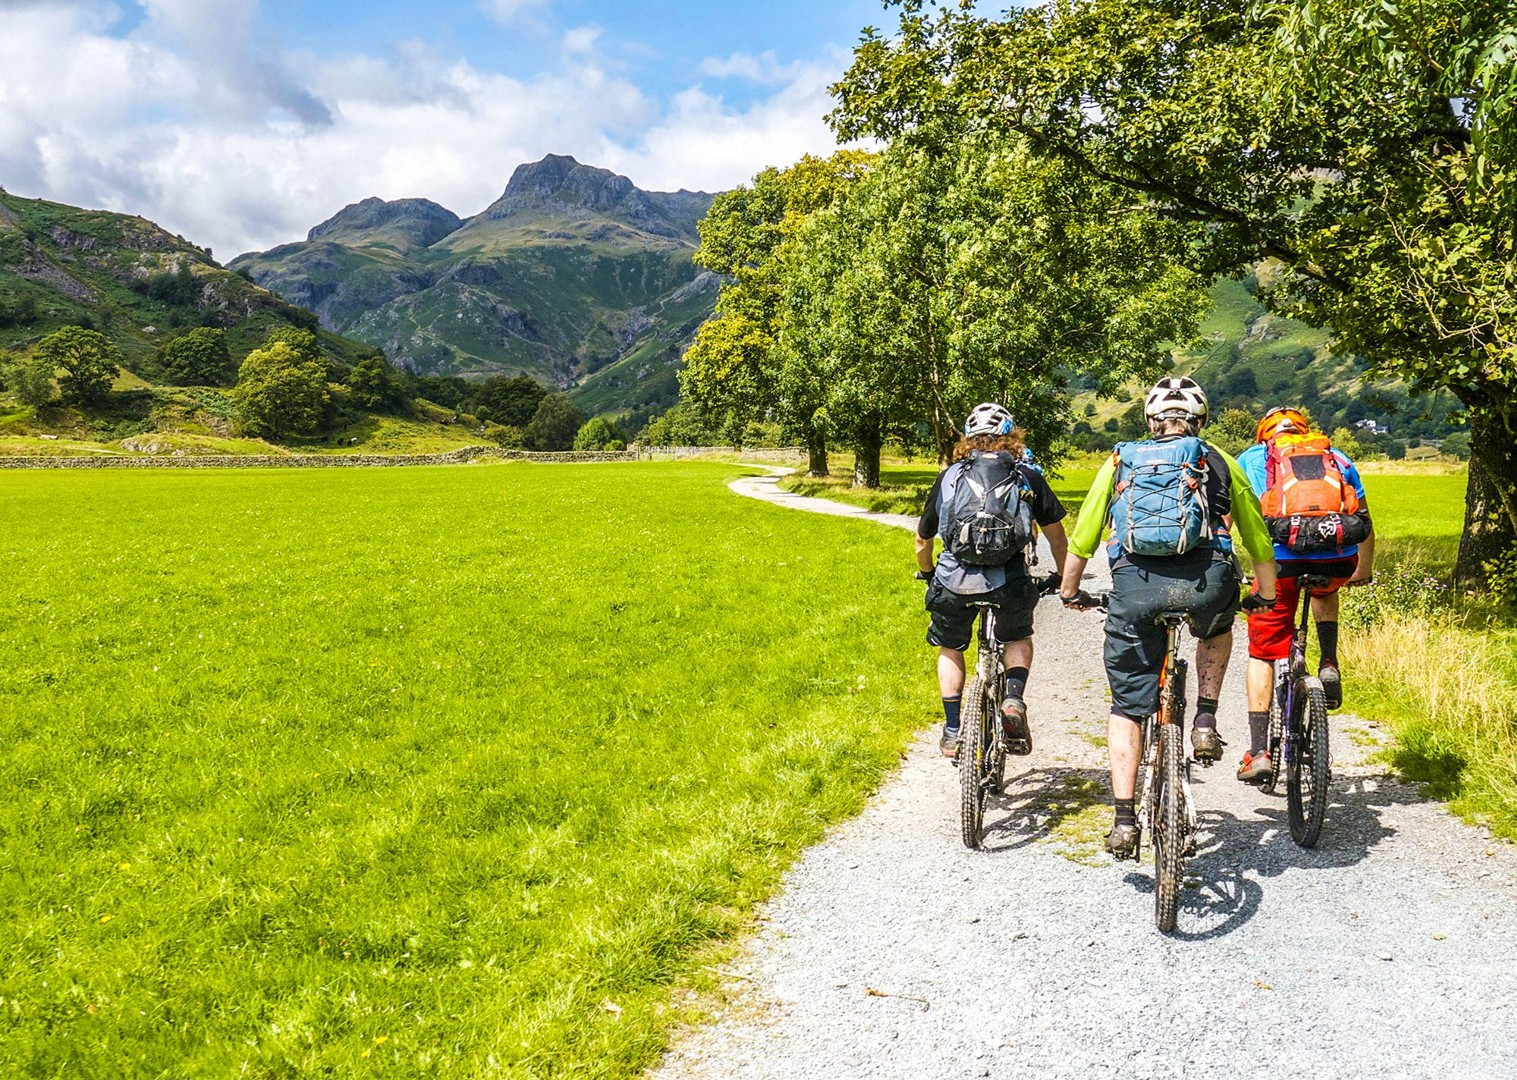 P1200287-2.jpg - UK - Lake District - Electric Ambleside - Electric Mountain Bike Weekend - Mountain Biking